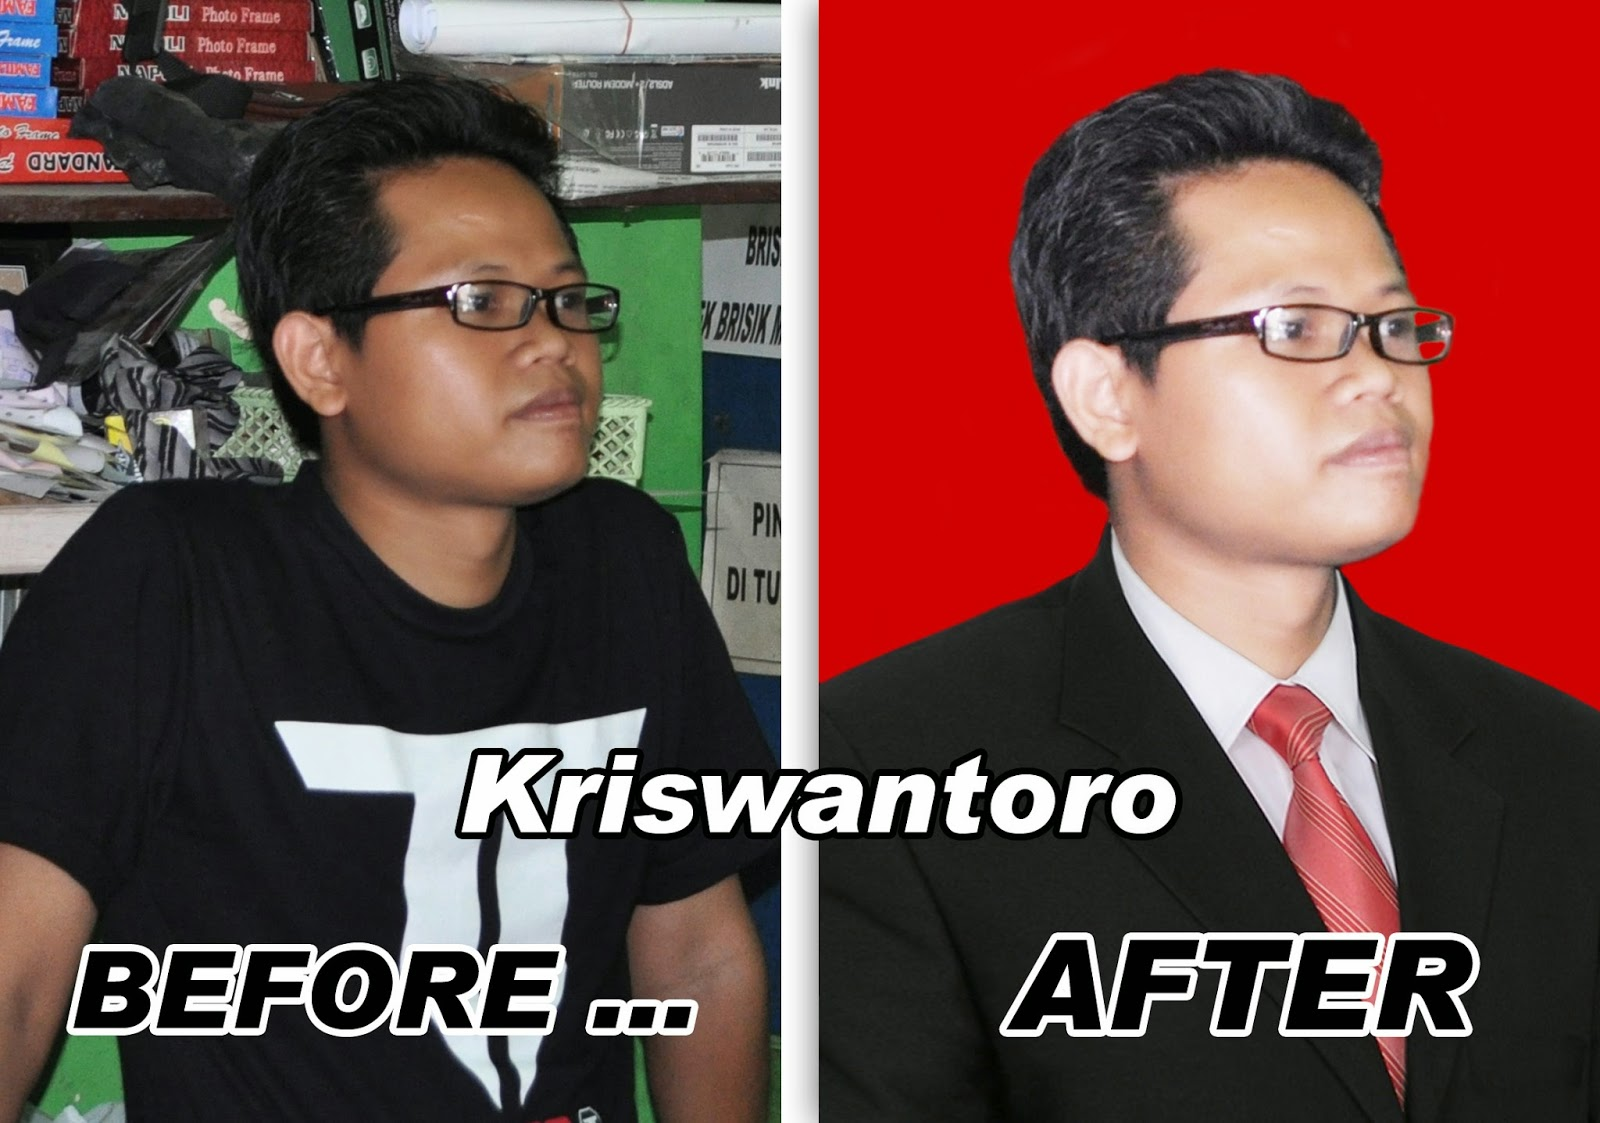 http://kuwarasanku.blogspot.com/2014/11/gambar-kriswantoro-kuwarasan.html